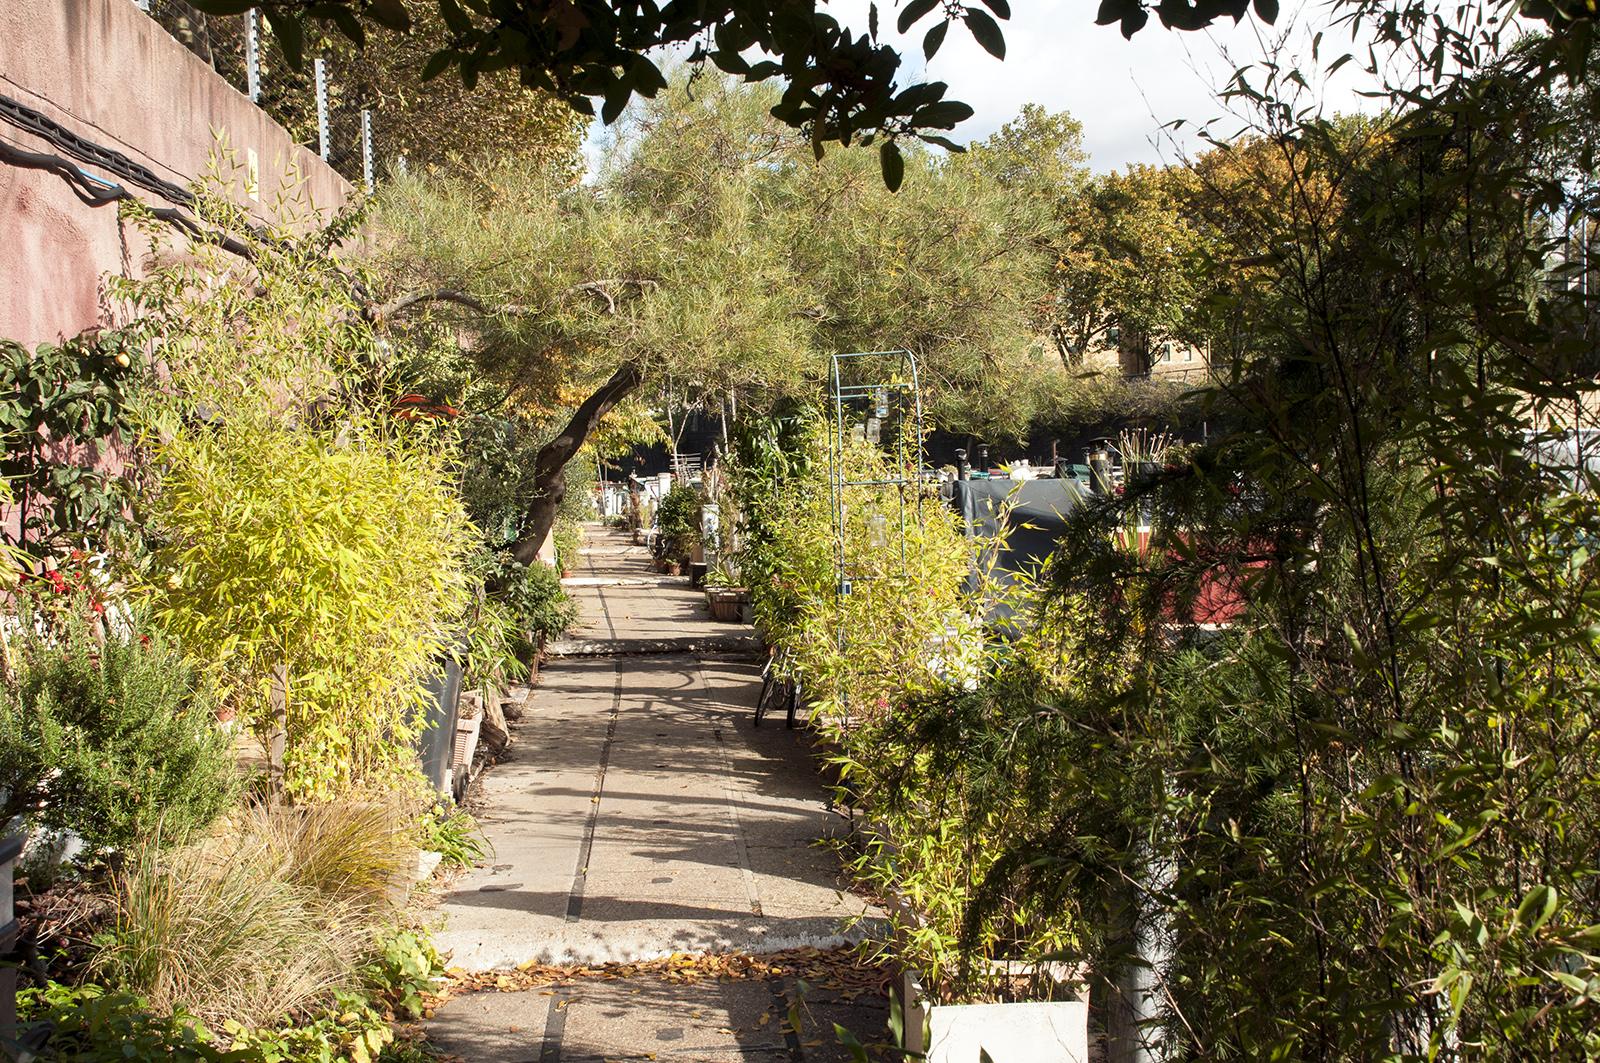 2016-10-18-Camden_Regents-Canal_Autumn_Flora-Narrowboat-Gardens-beside-the-Canal